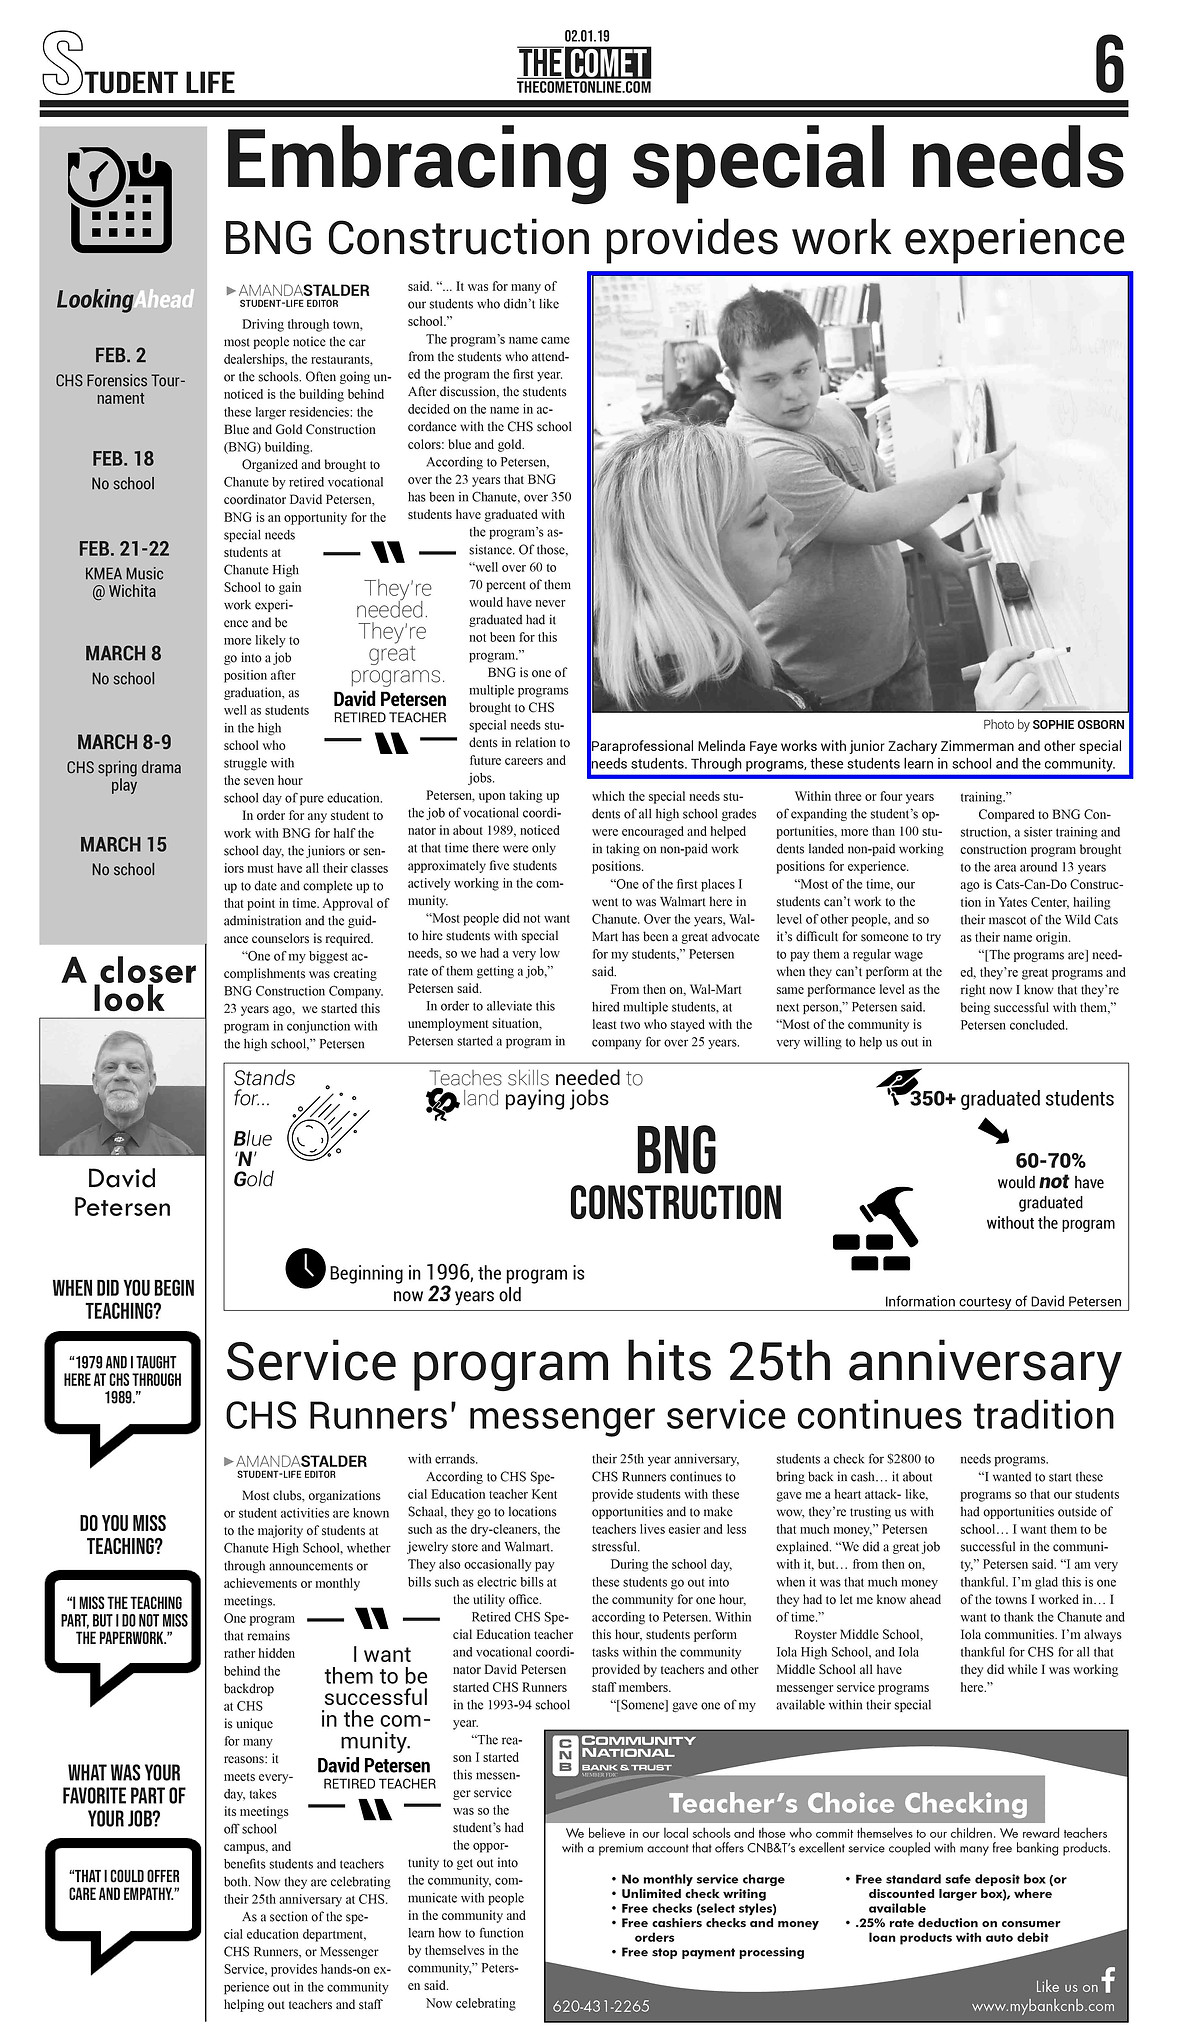 2-1-2019 Page 6-JPEG.jpg